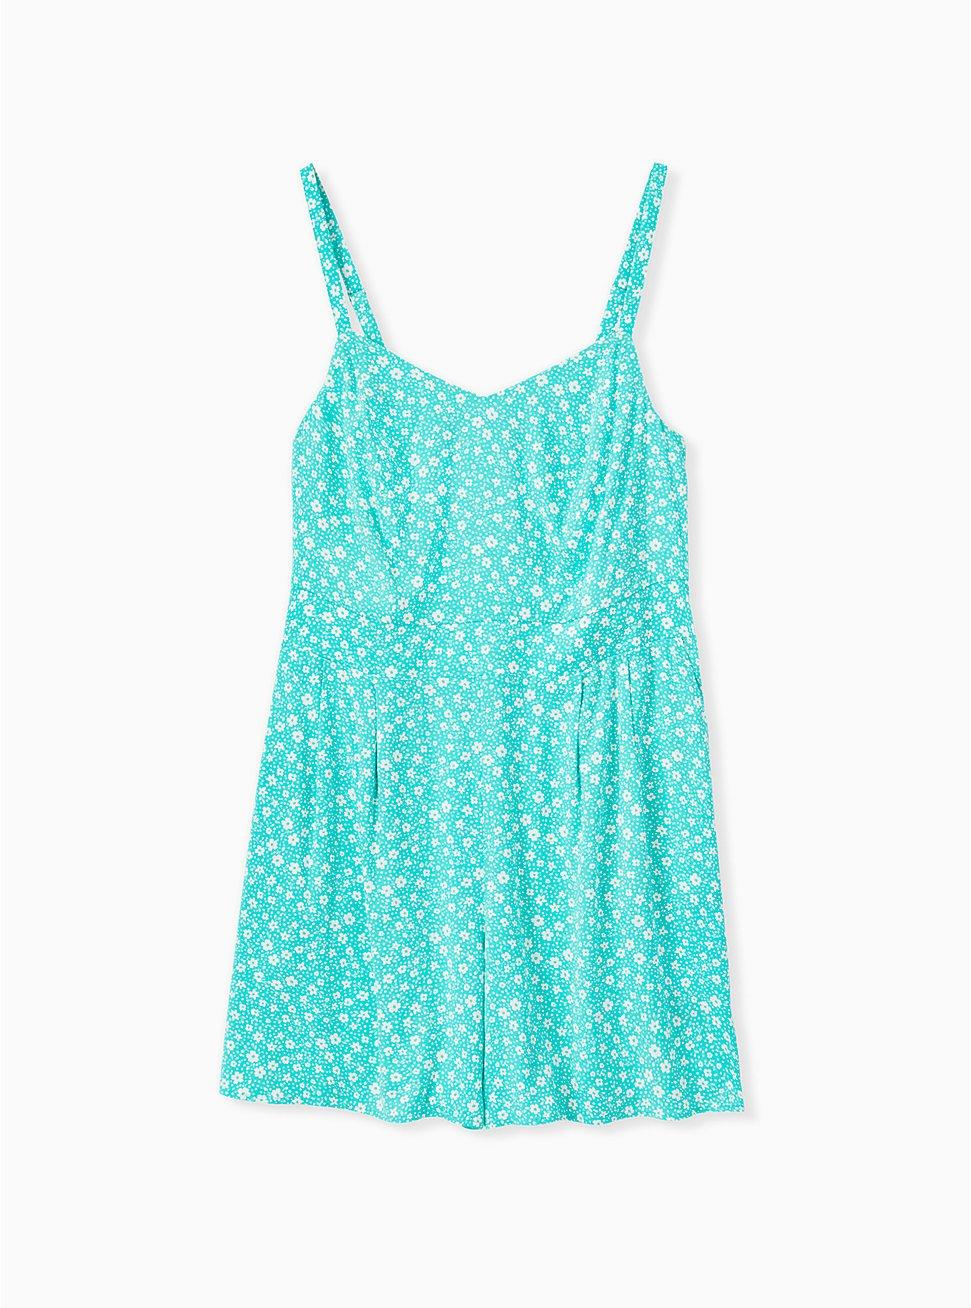 Turquoise Floral Challis Romper, STRIPE - BLUE, hi-res